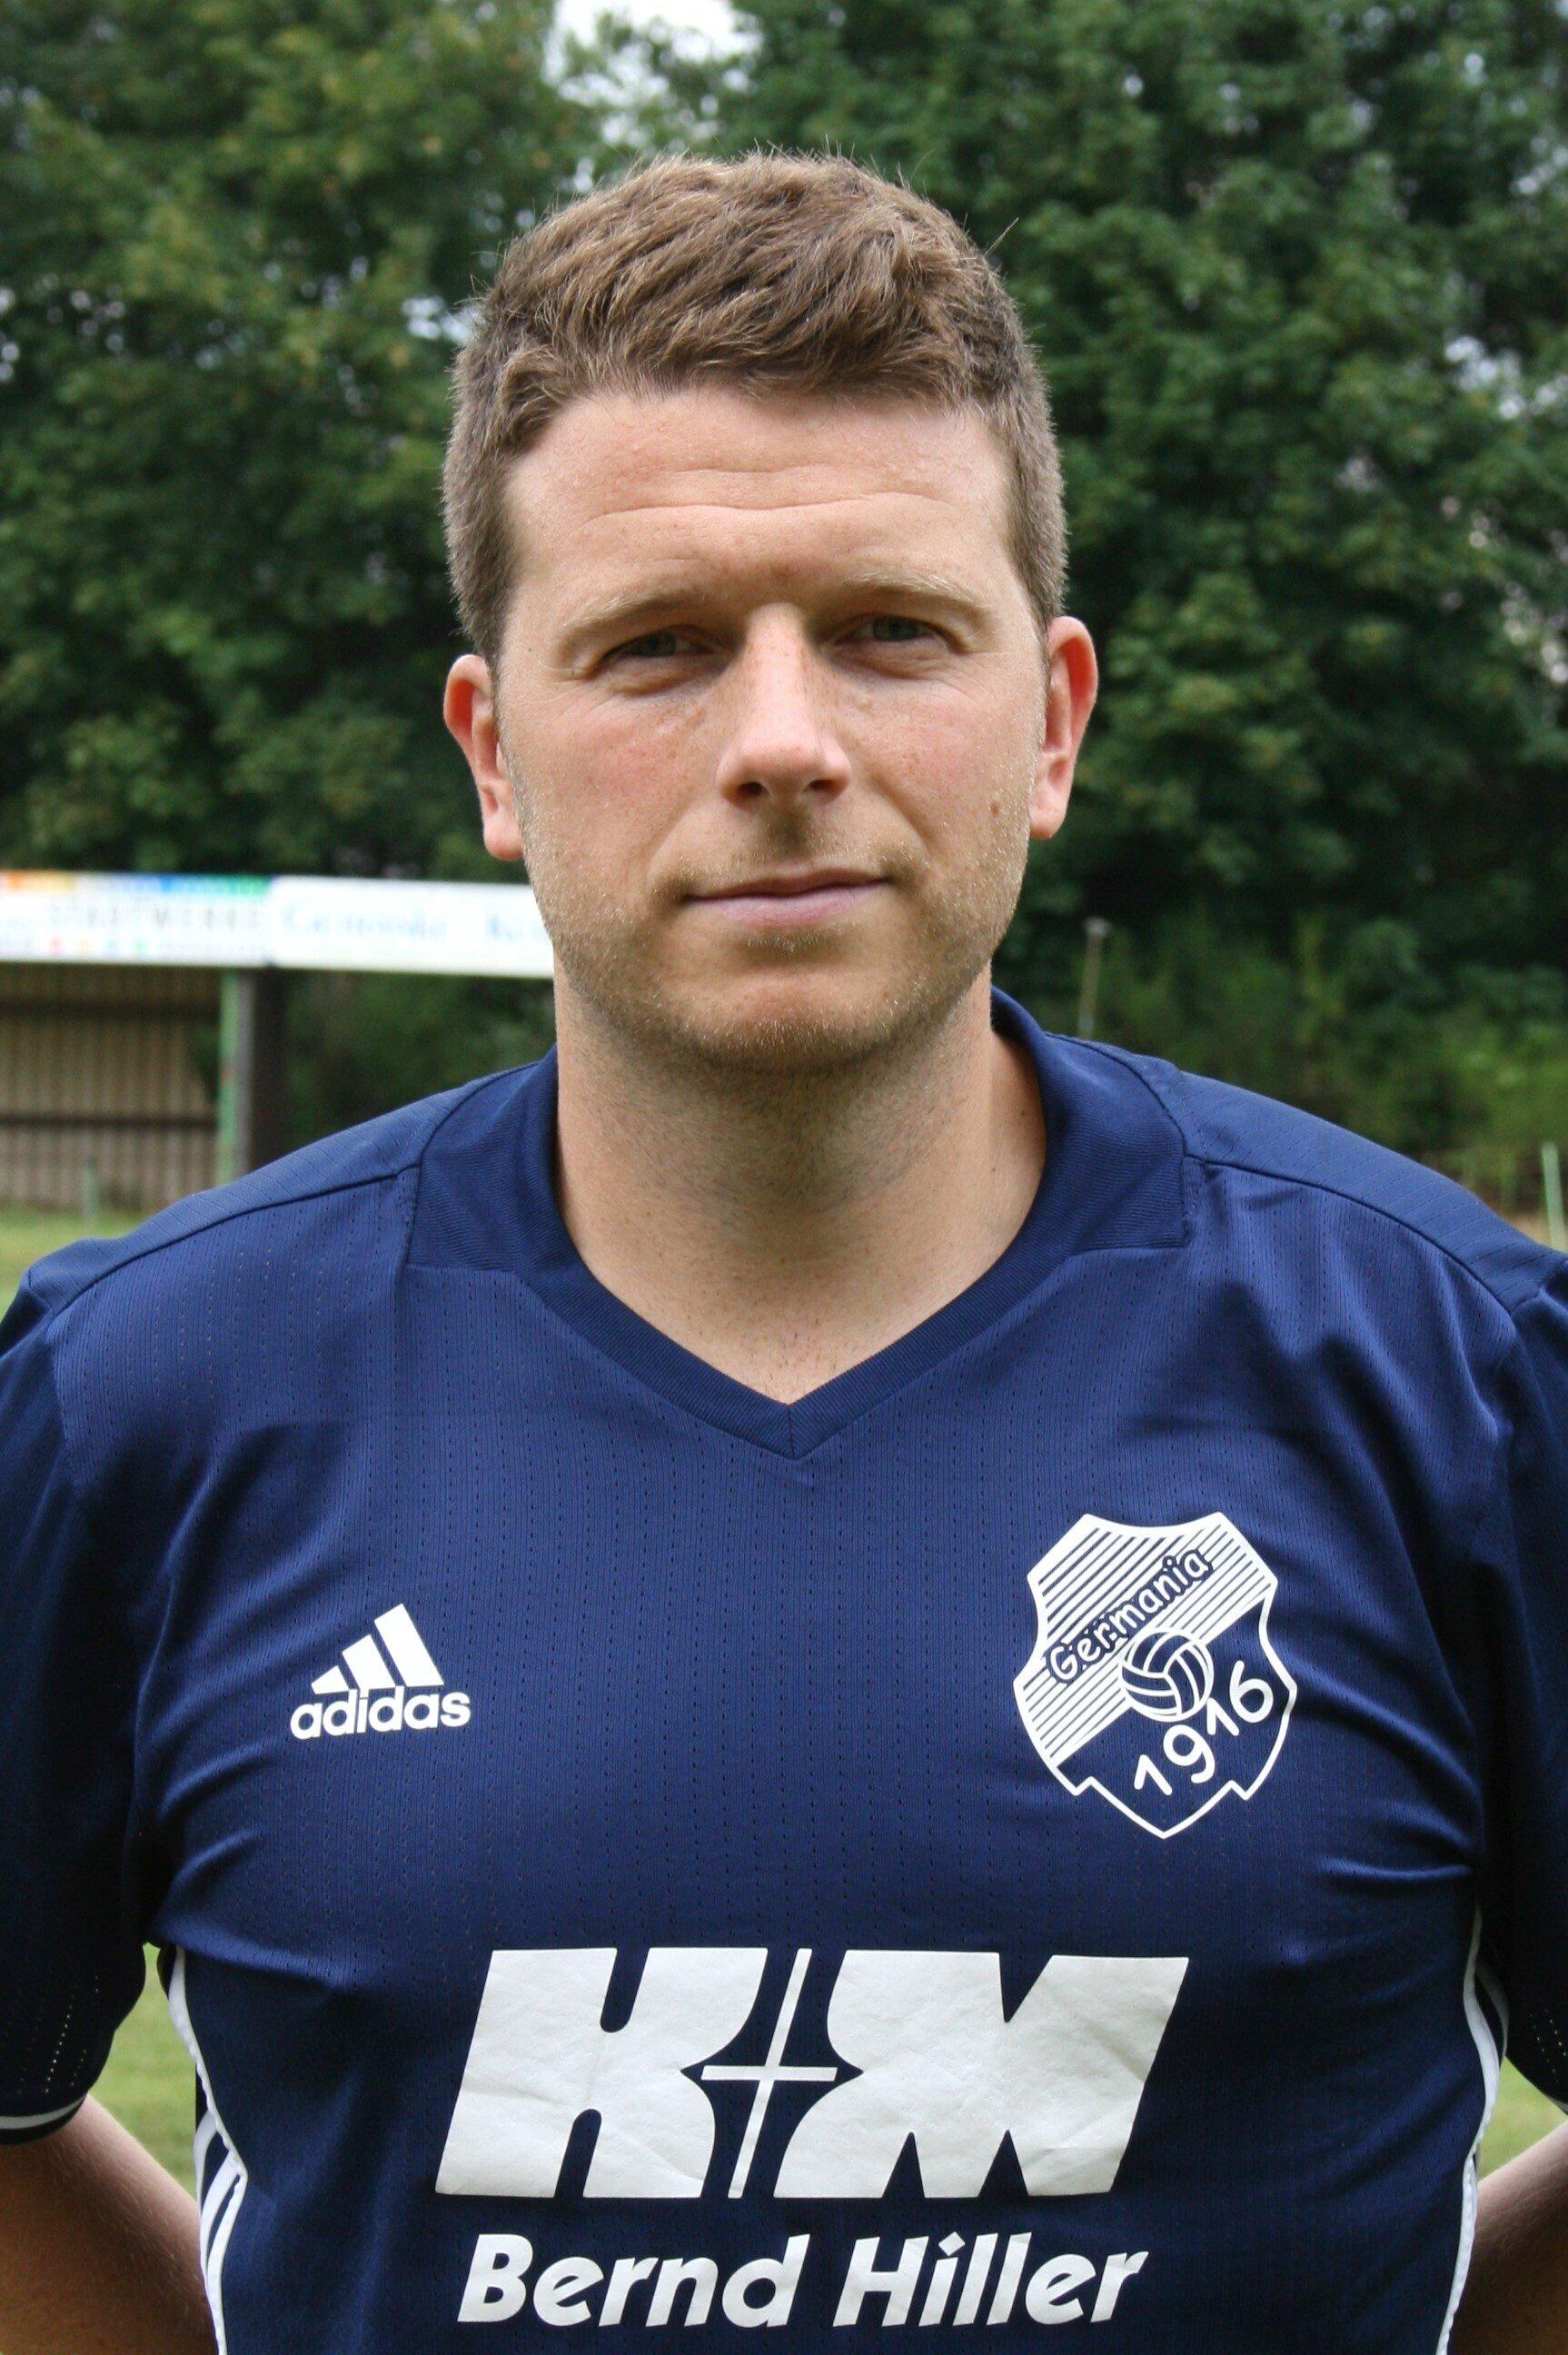 Christian Strehl